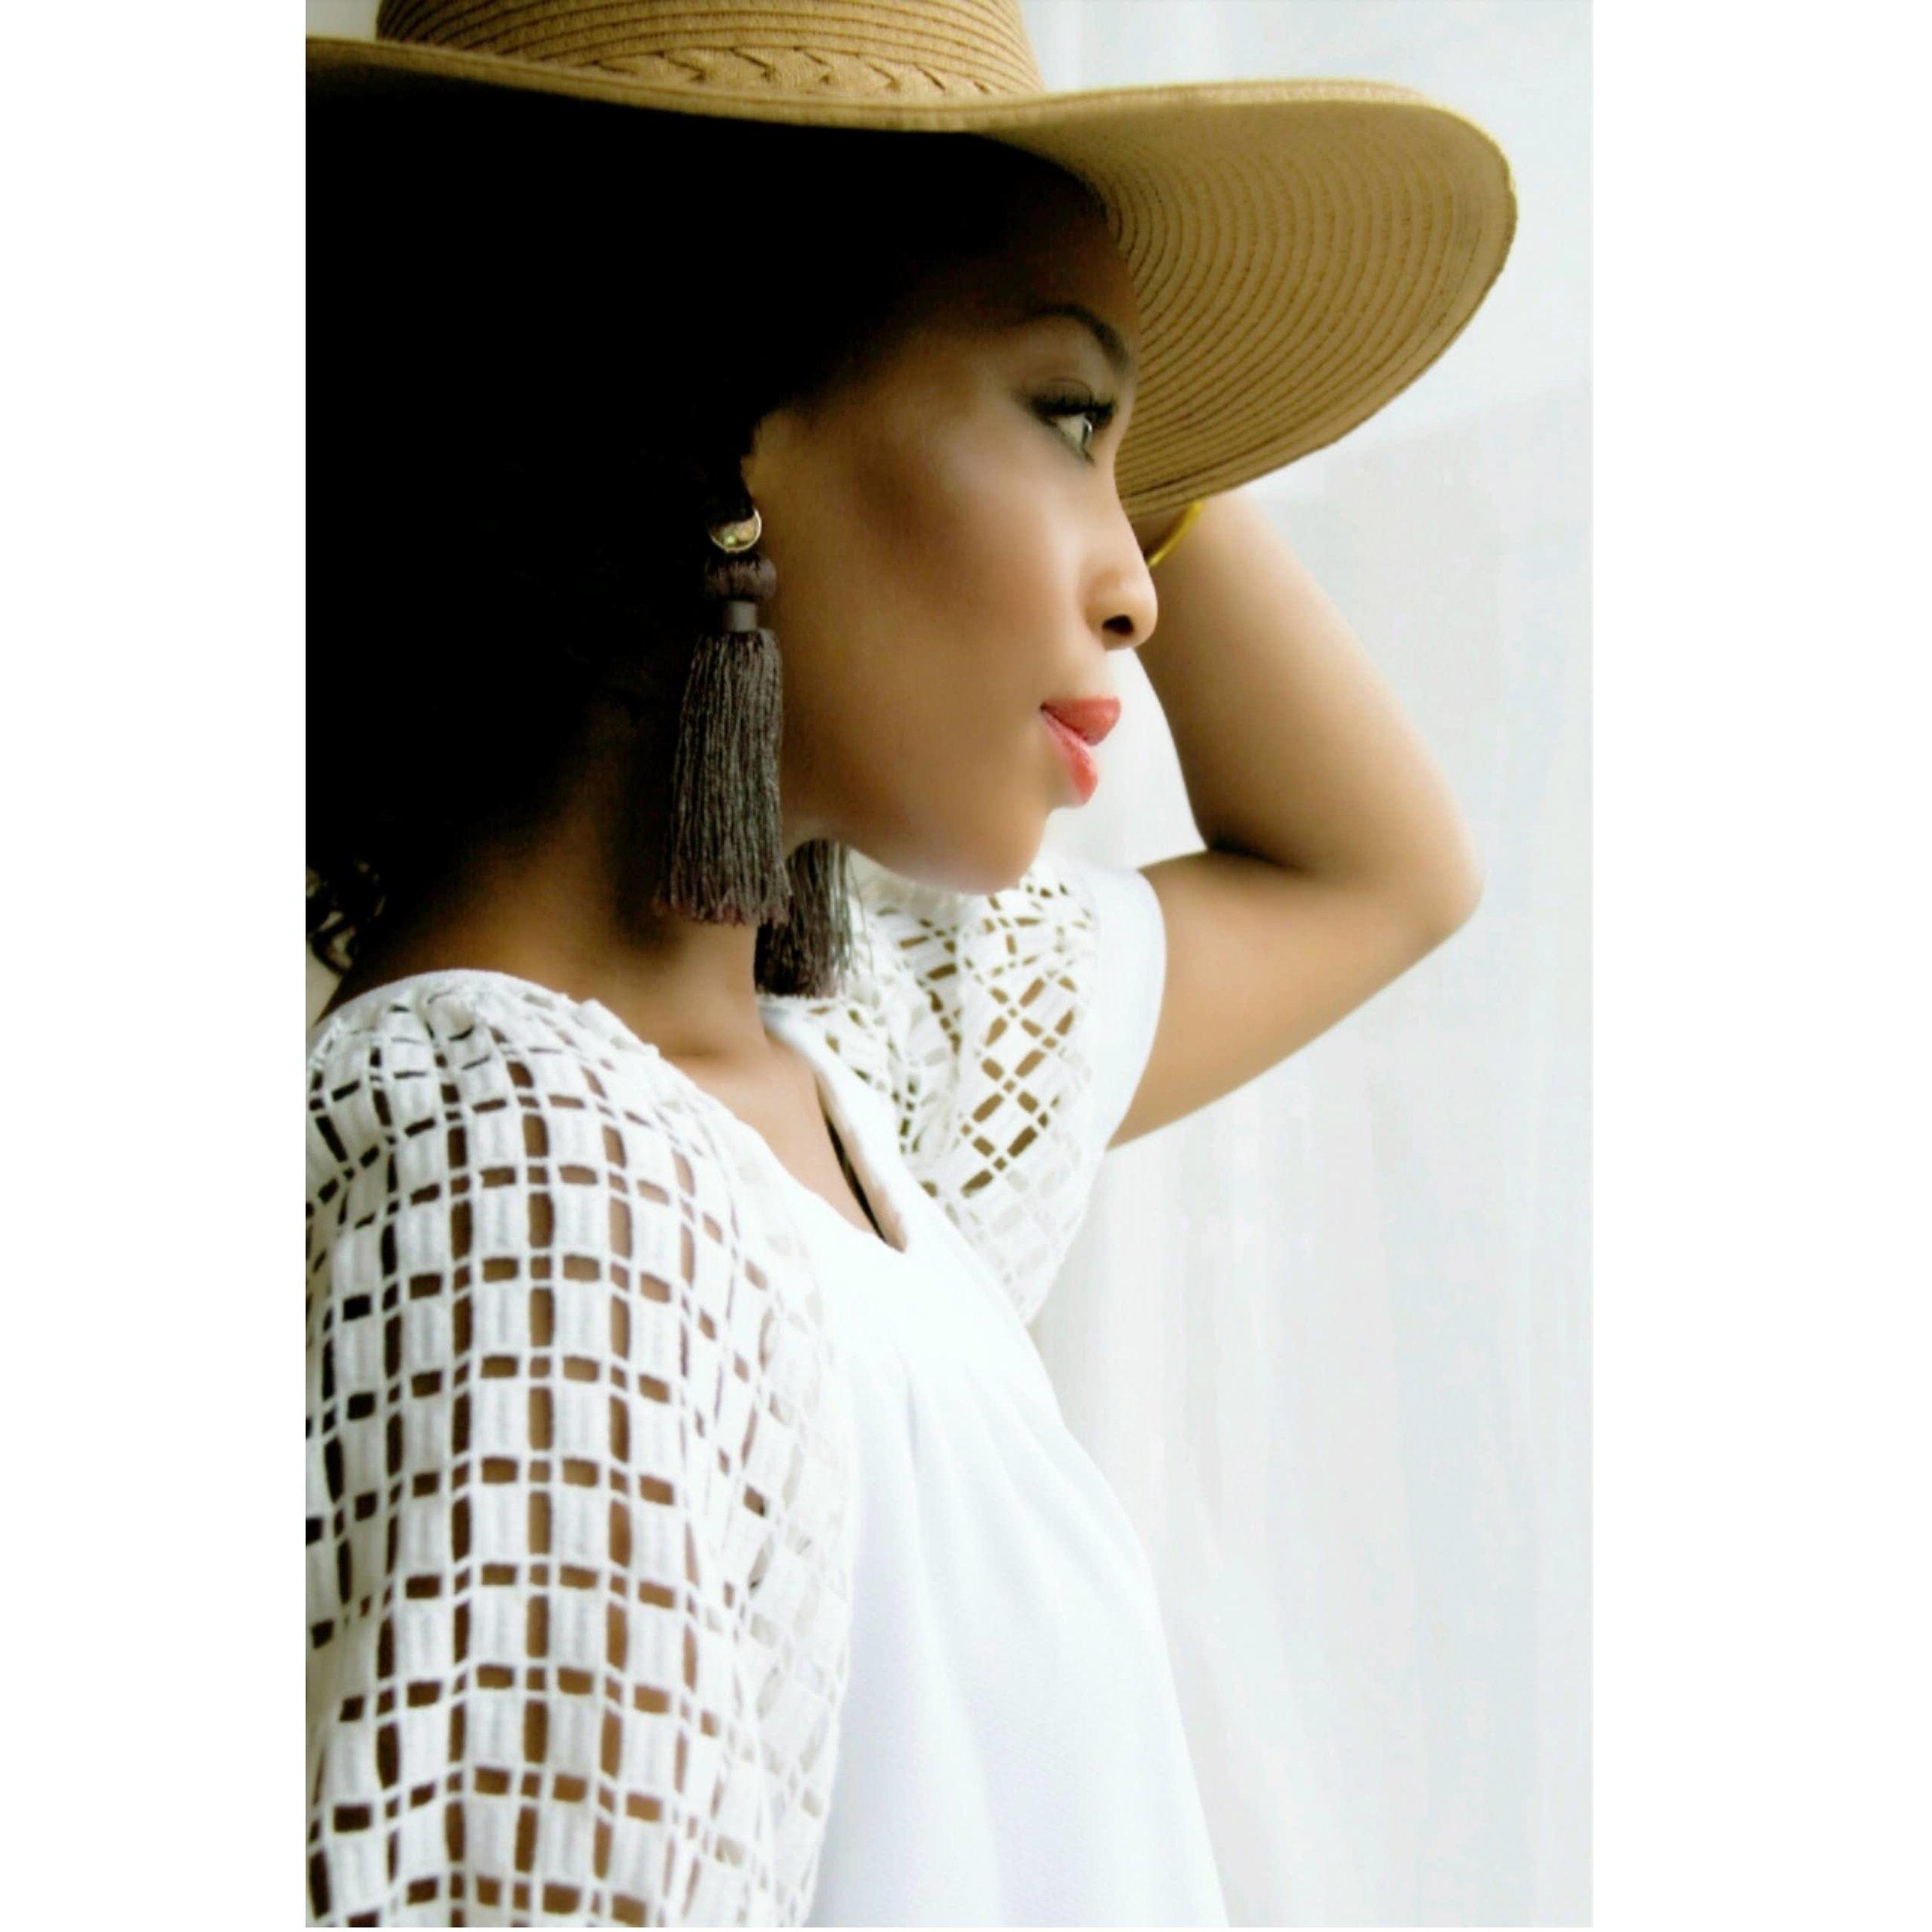 LaToya wearing the first piece of jewelry she created